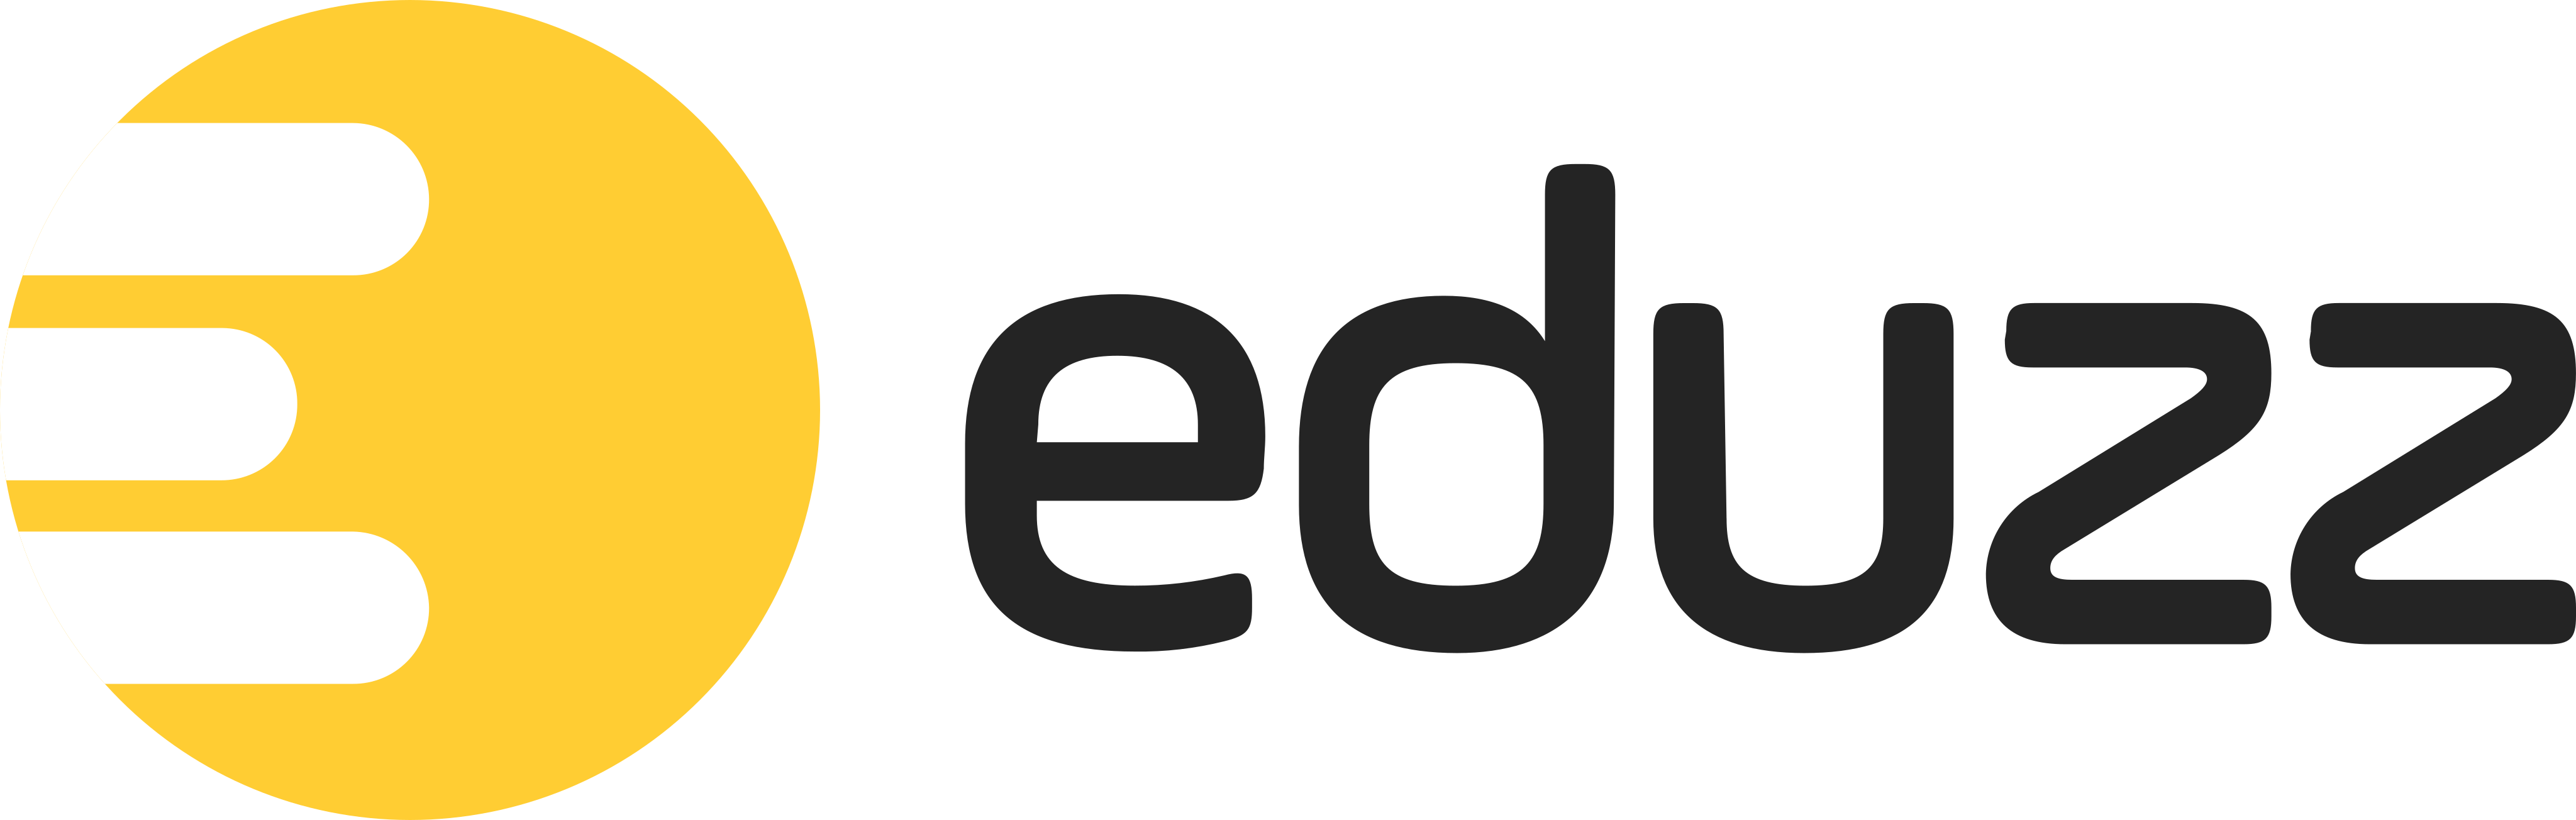 Eduzz logo.